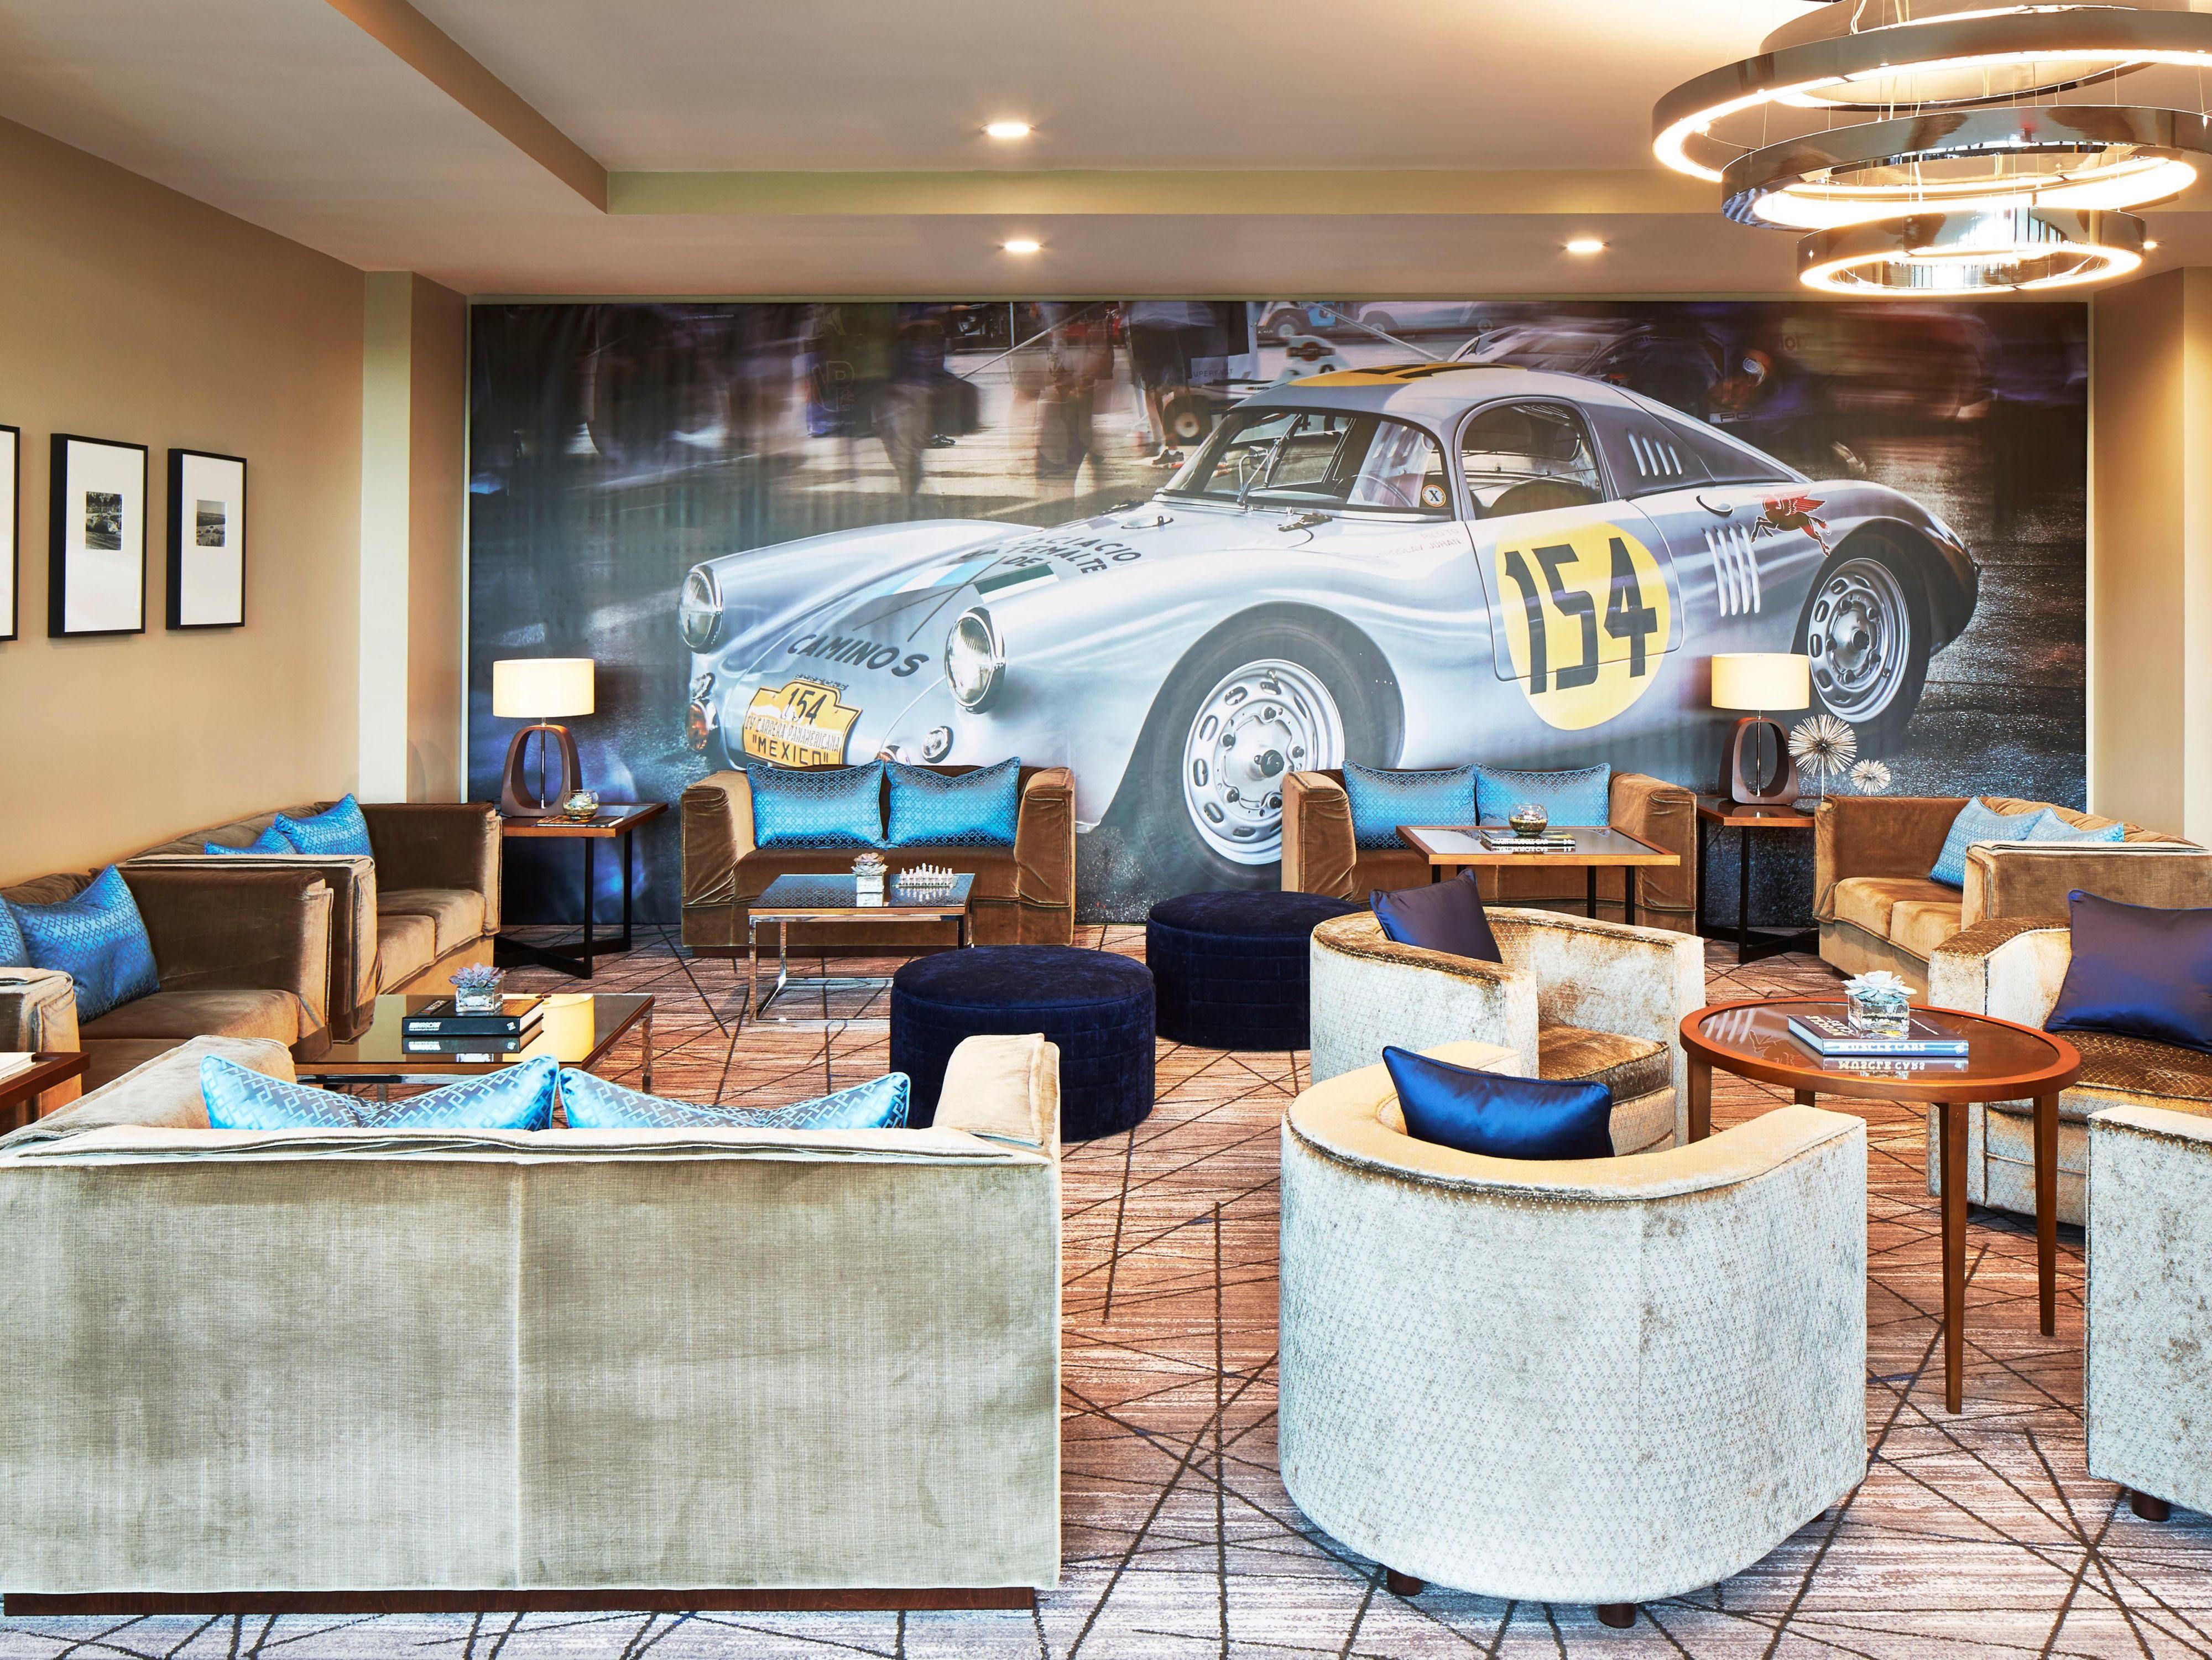 Find Boutique Hotels in Atlanta from Hotel Indigo Hotels by IHG